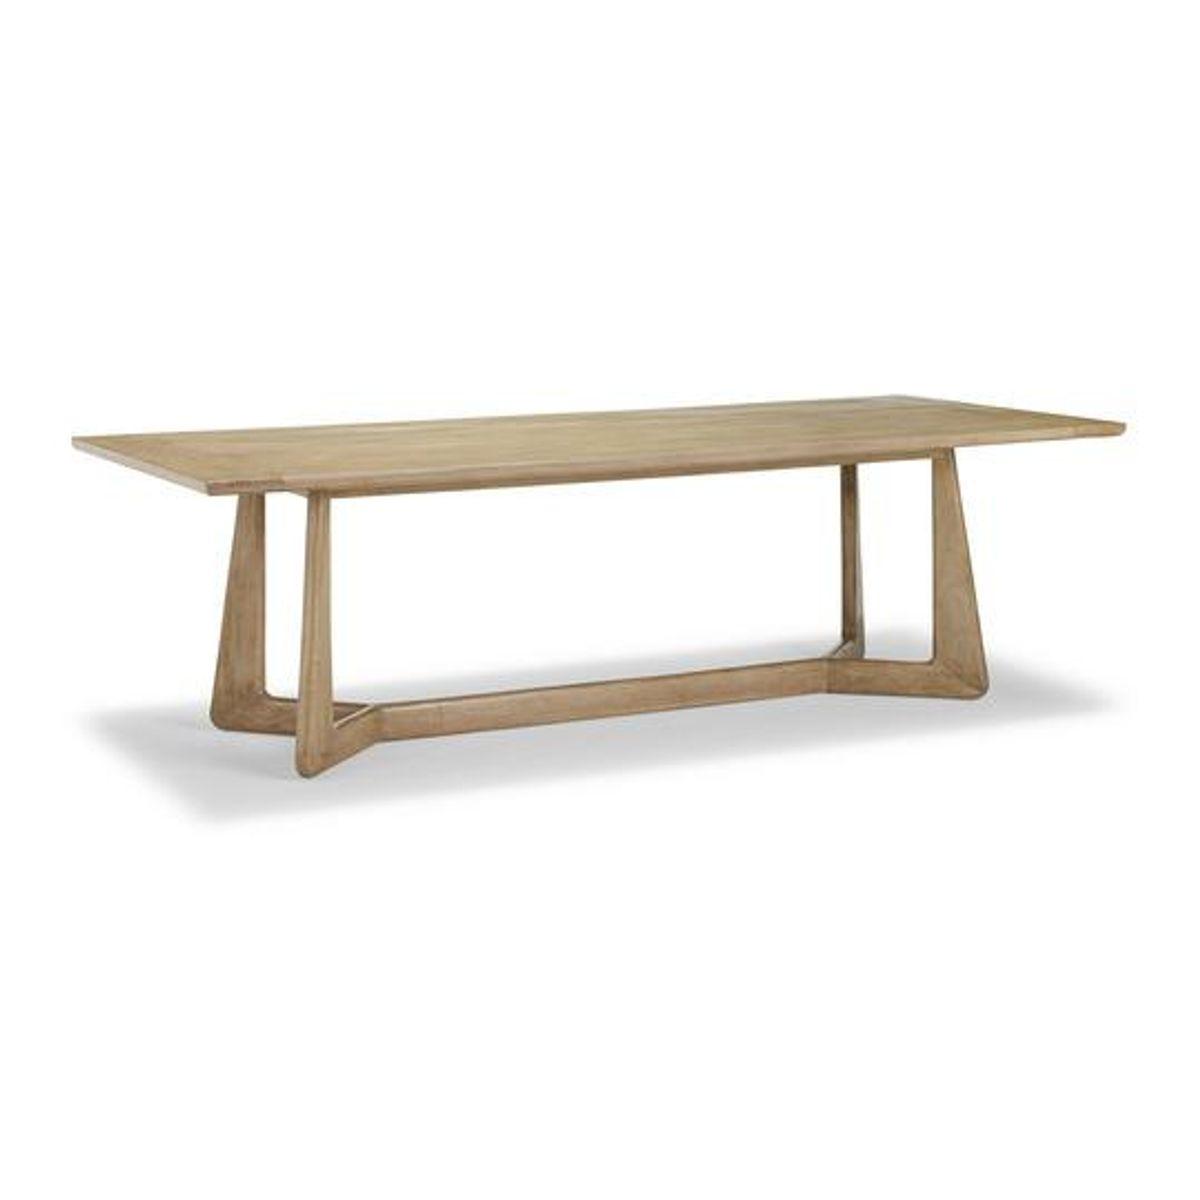 gregorius pineo hansen dining table